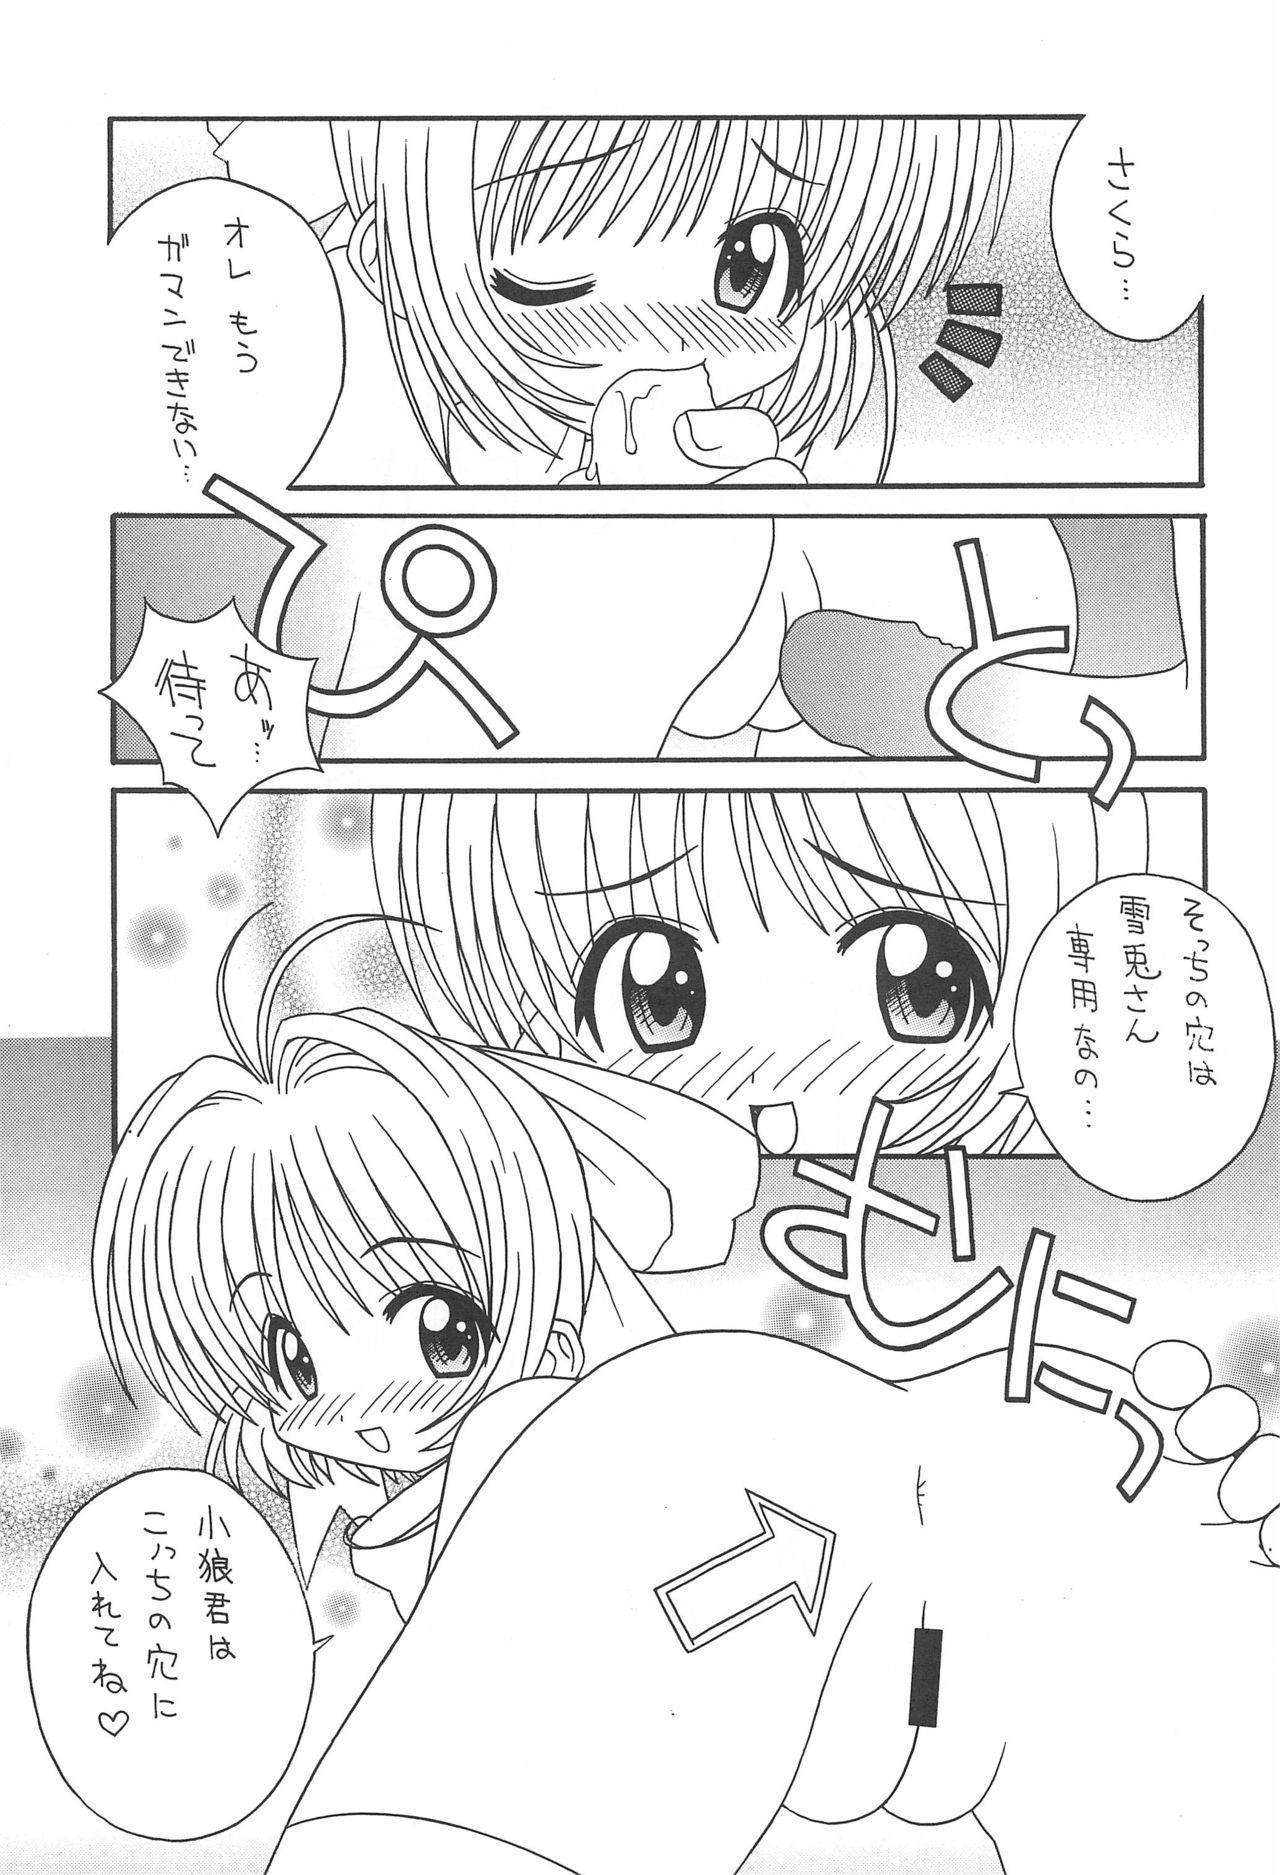 Soko da! Ninpou Youji Taikei no Jutsu 2nd 8